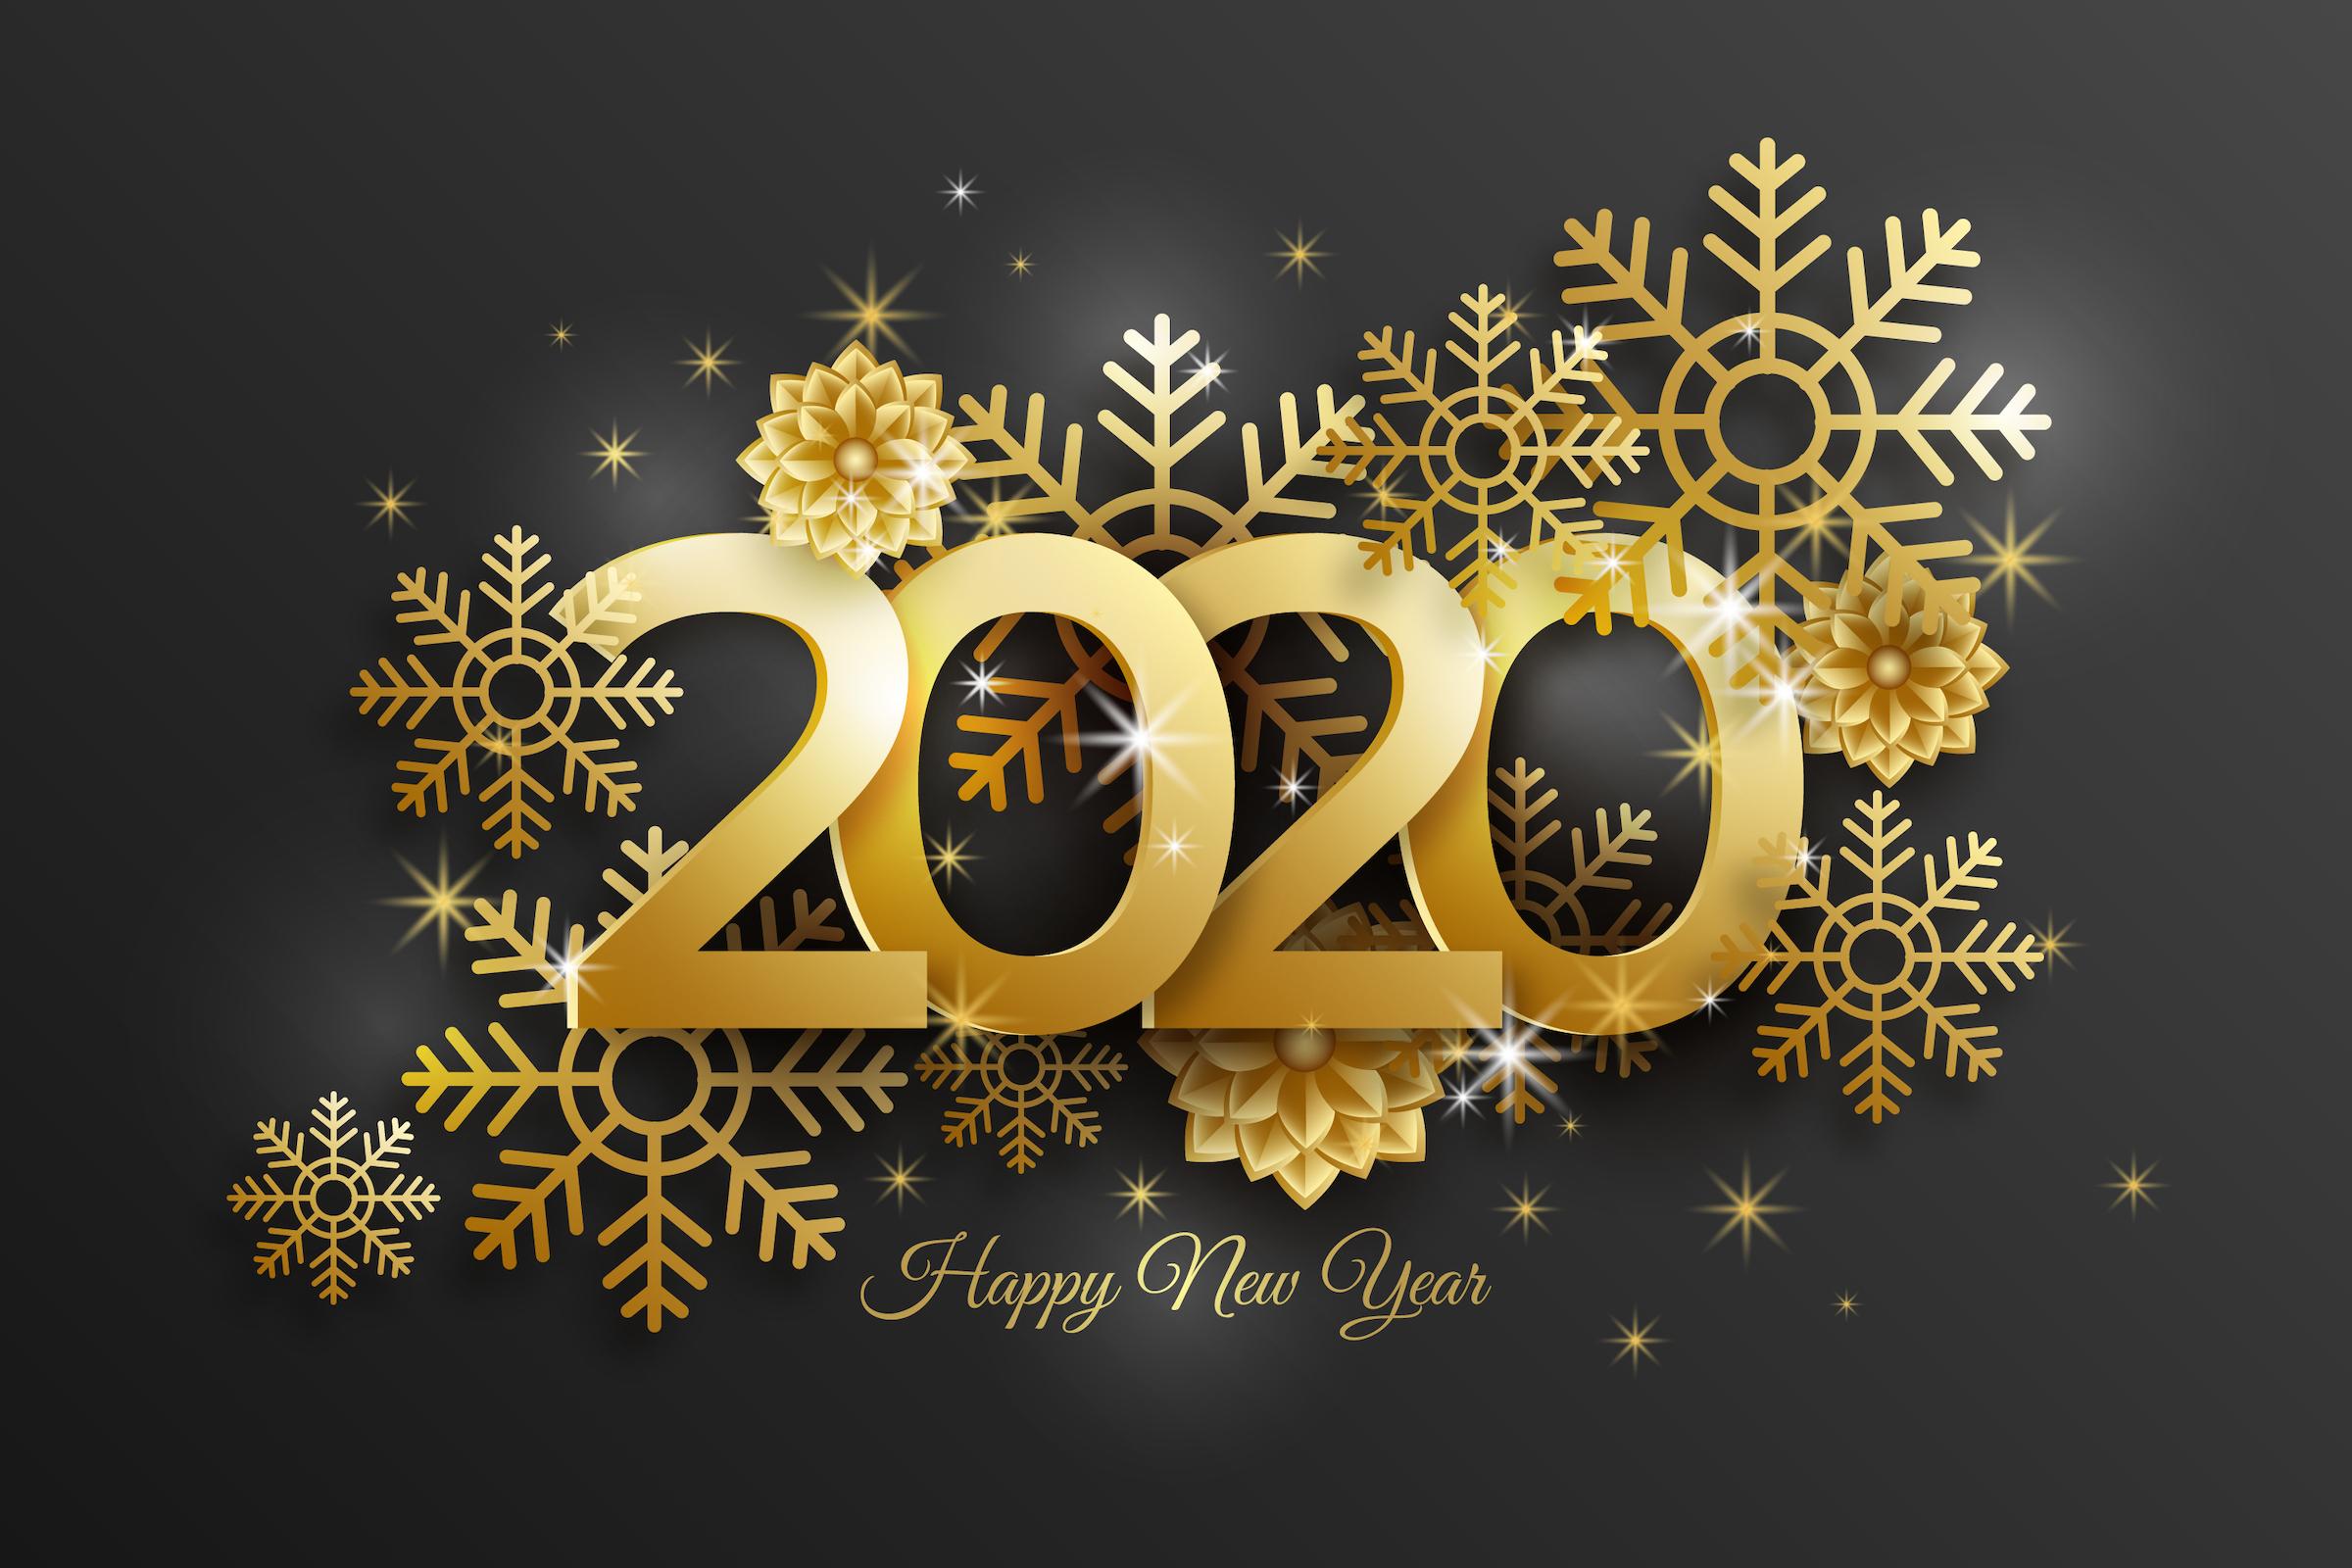 Happy New Year 2020 Royal Black